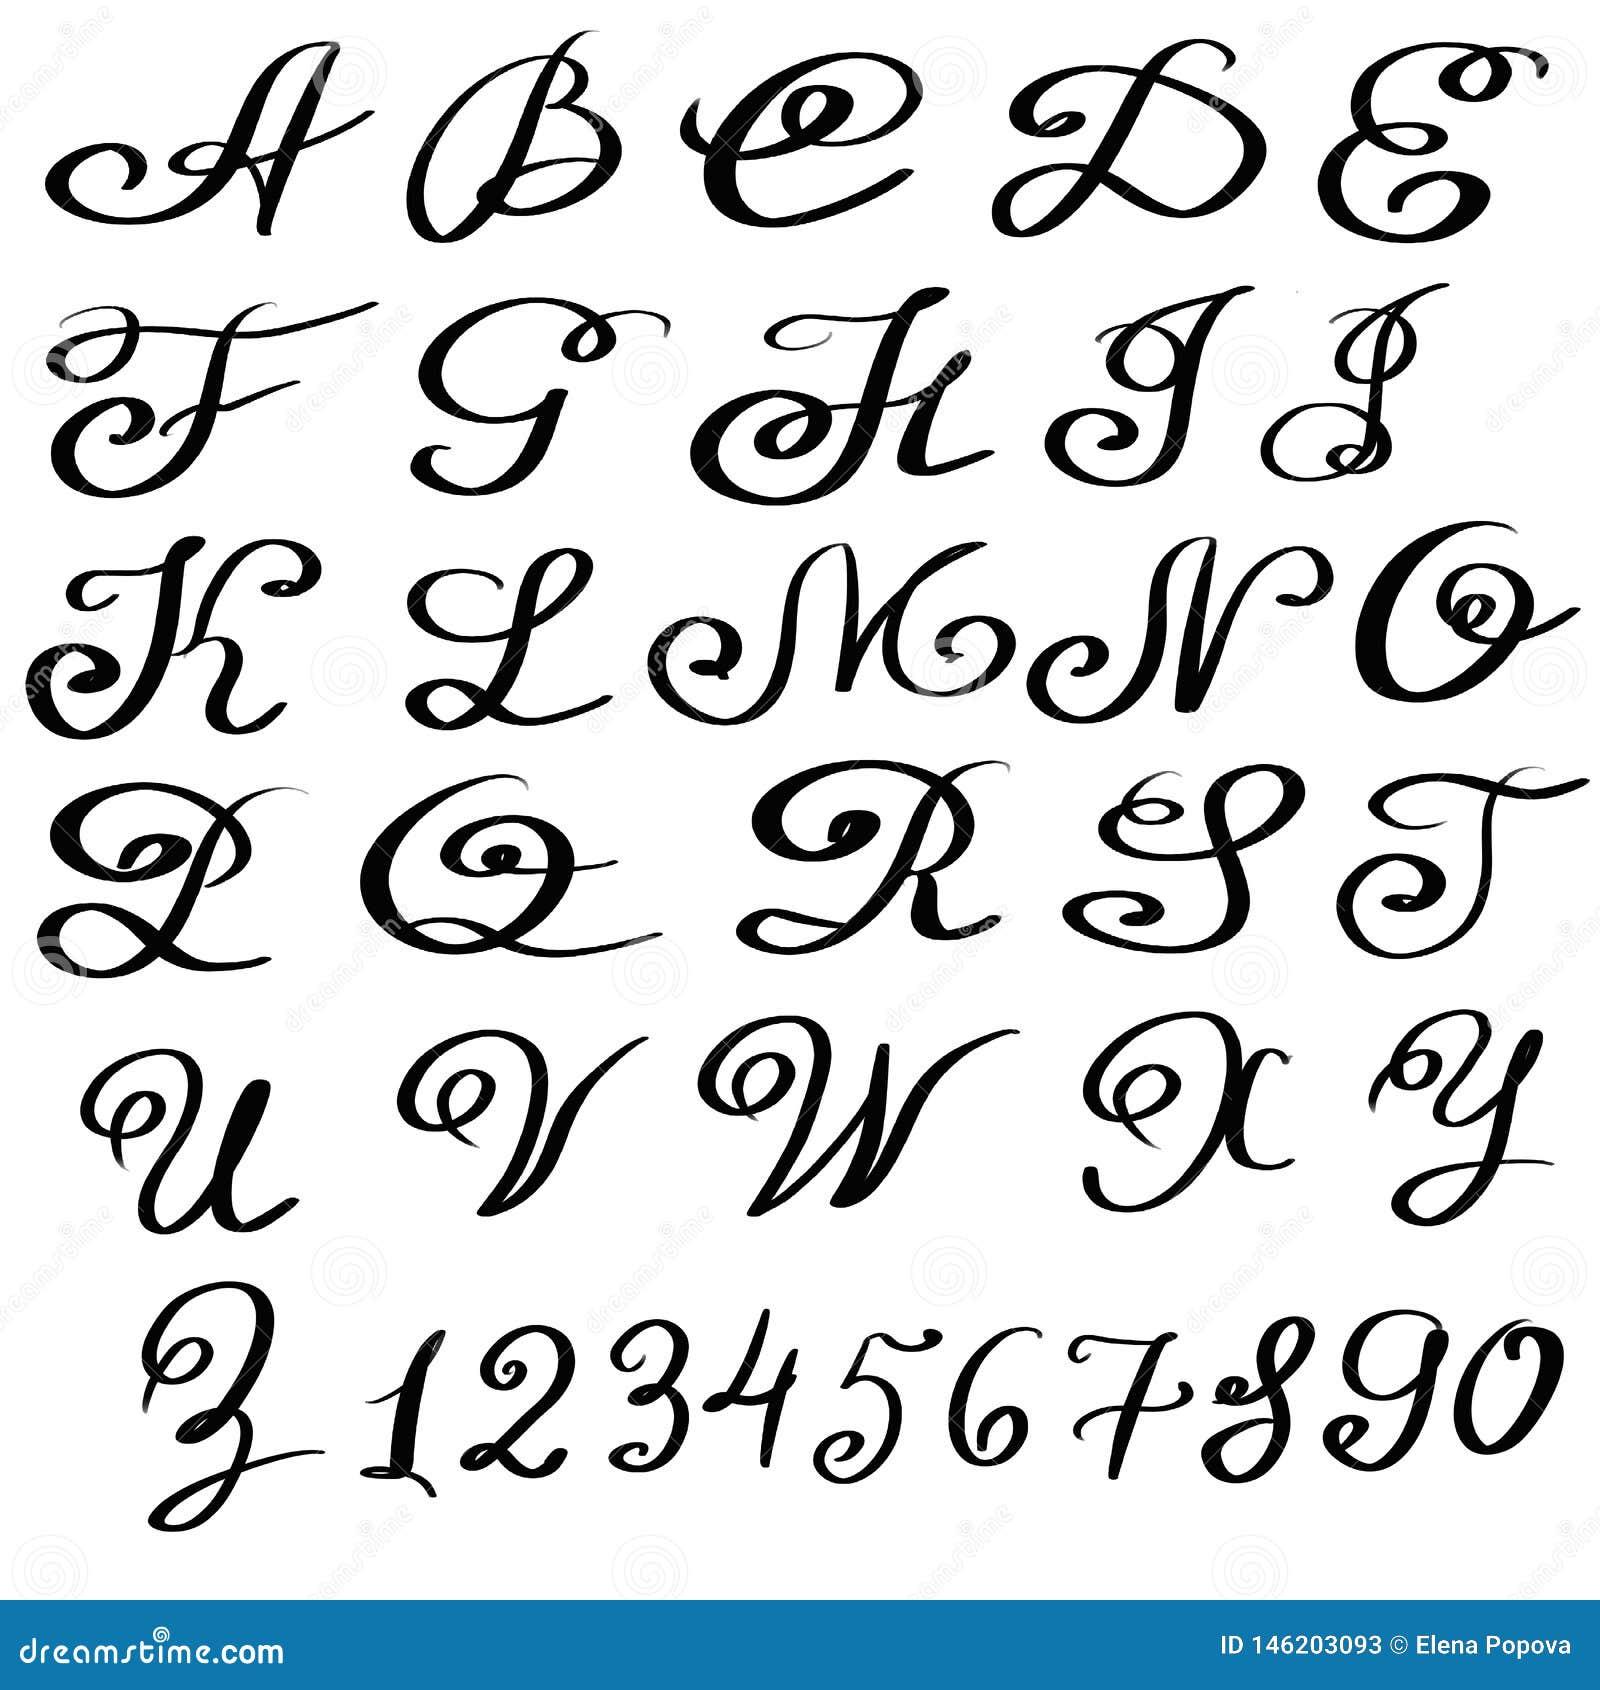 Handwritten Artistic Font Isolated Letters On White Background Hand Drawn Alphabet For Your Design Stock Illustration Illustration Of Design Alphabet 146203093